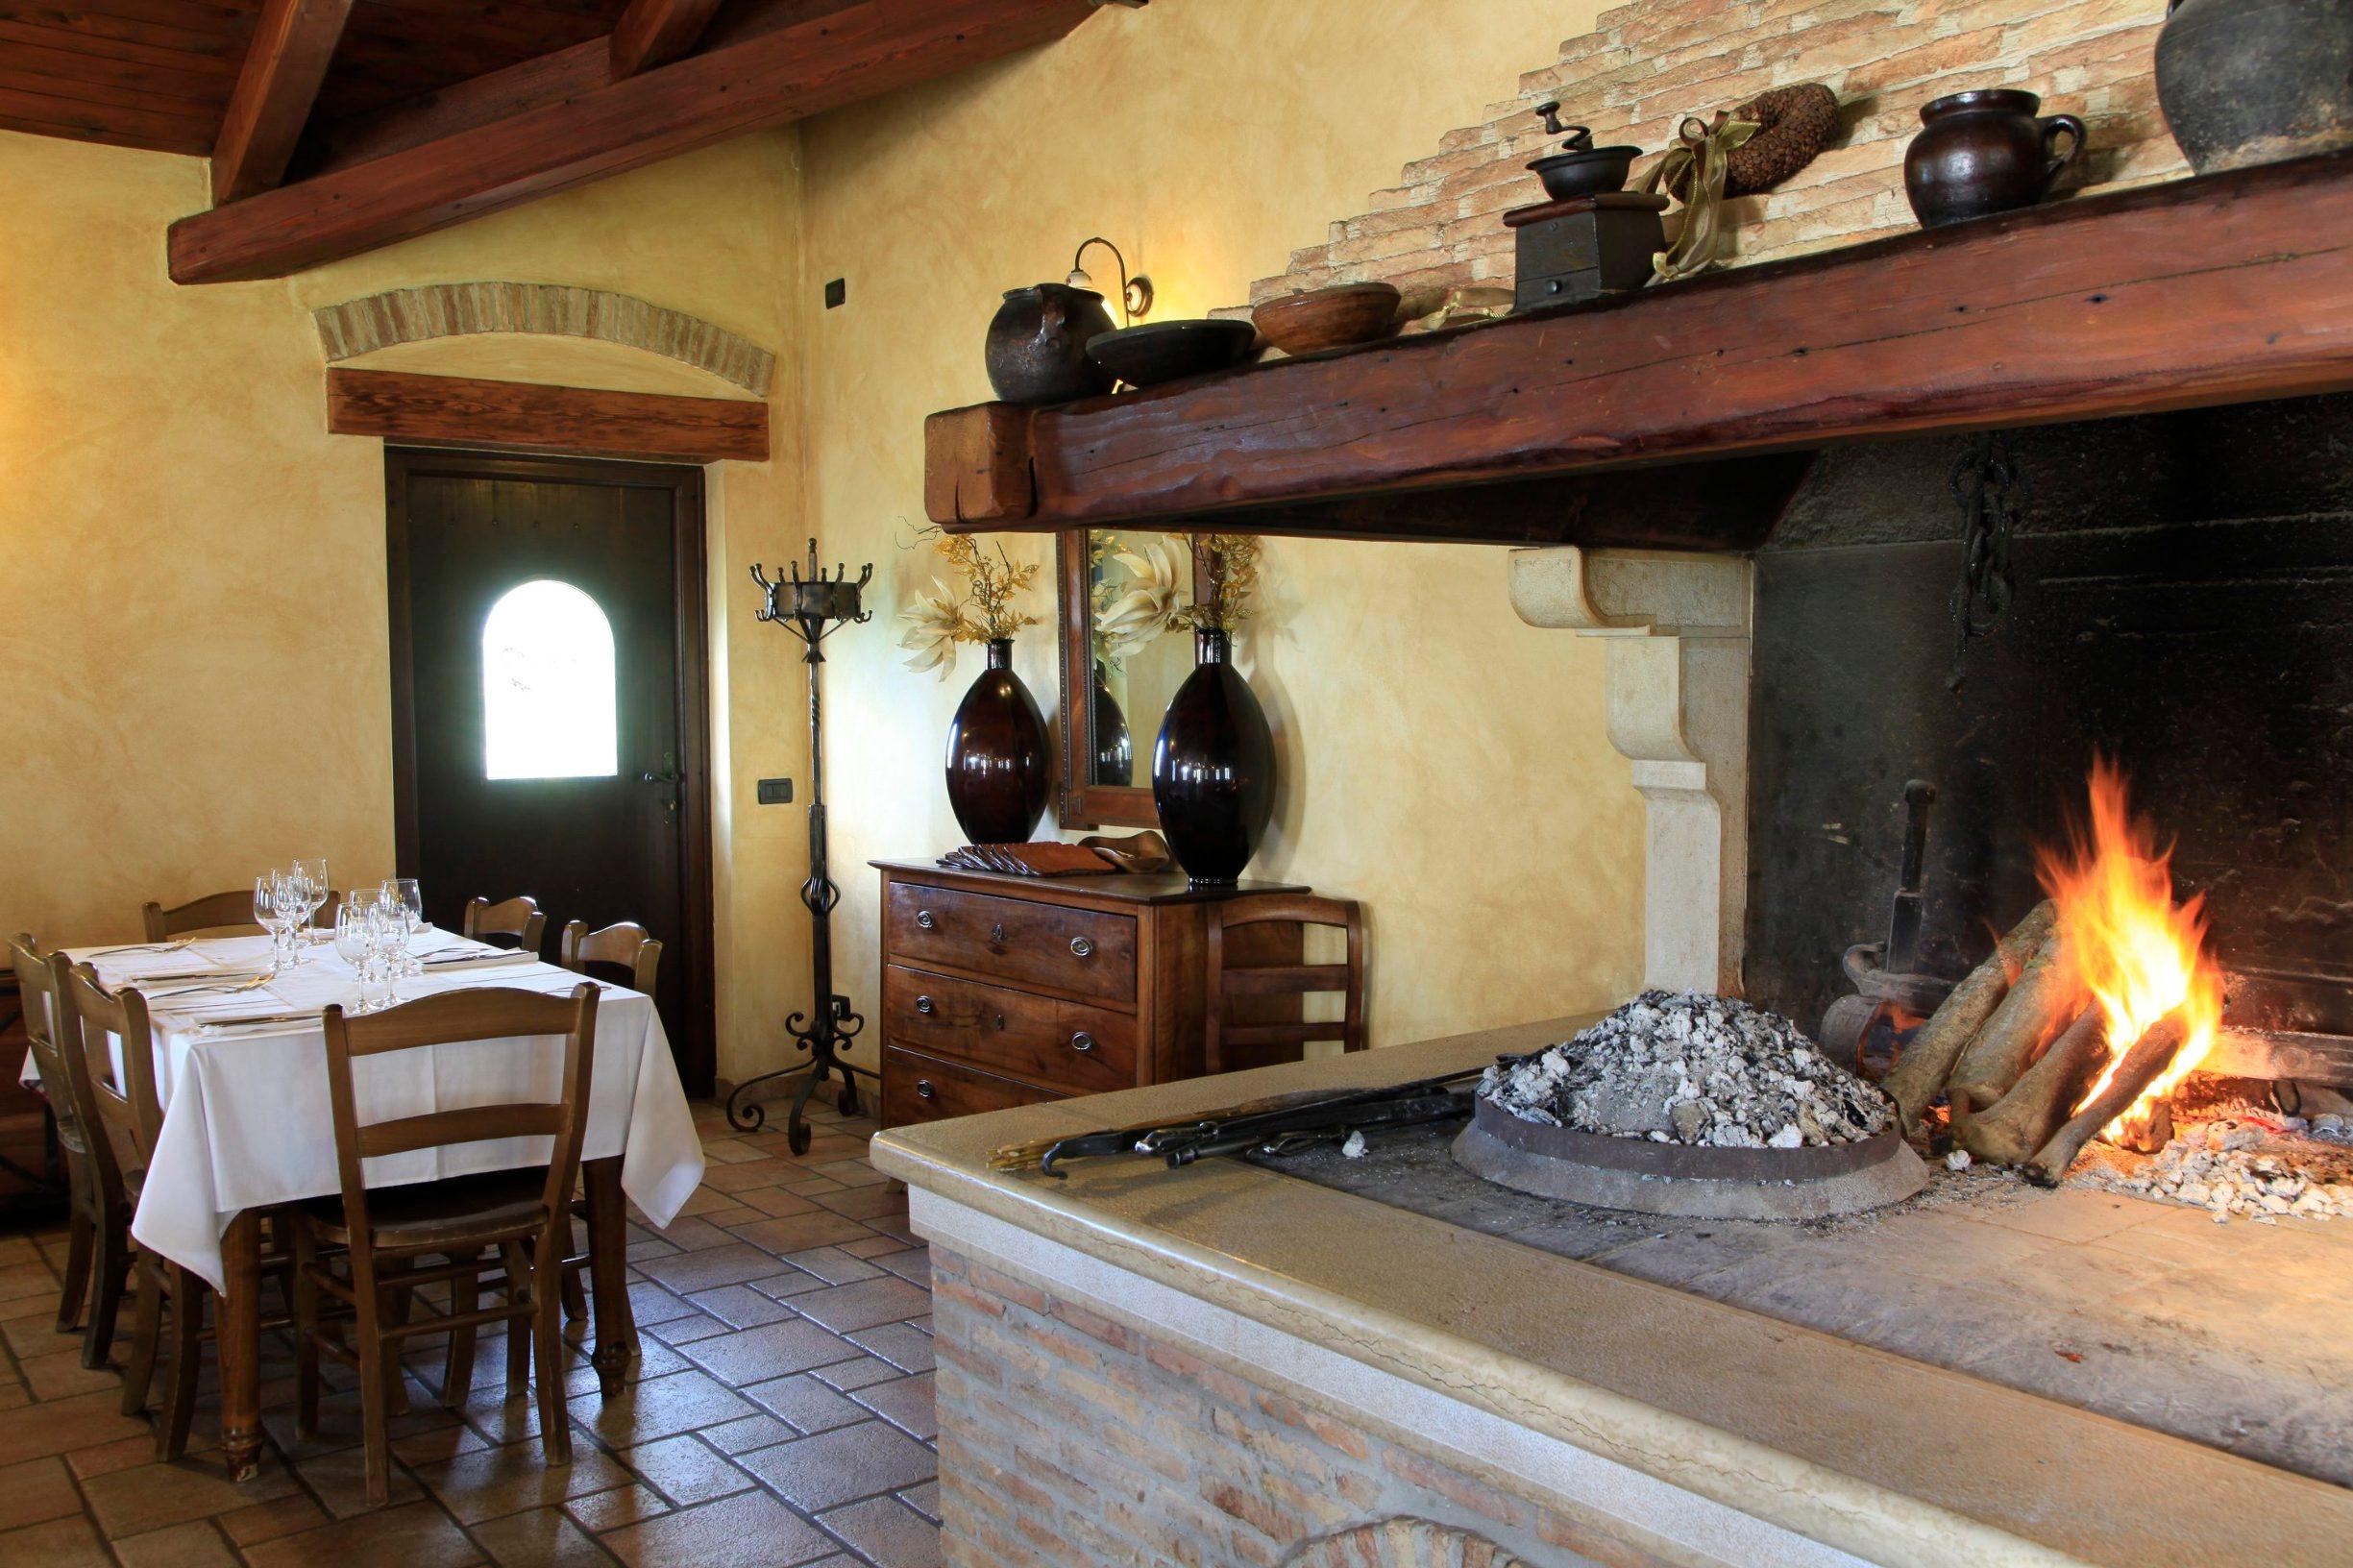 Valbandon kraj Pule, 151015. Restoran Beccaccia u Valbandonu u vlasnistvu obitelji Radolovic.  Foto: Goran Sebelic / CROPIX